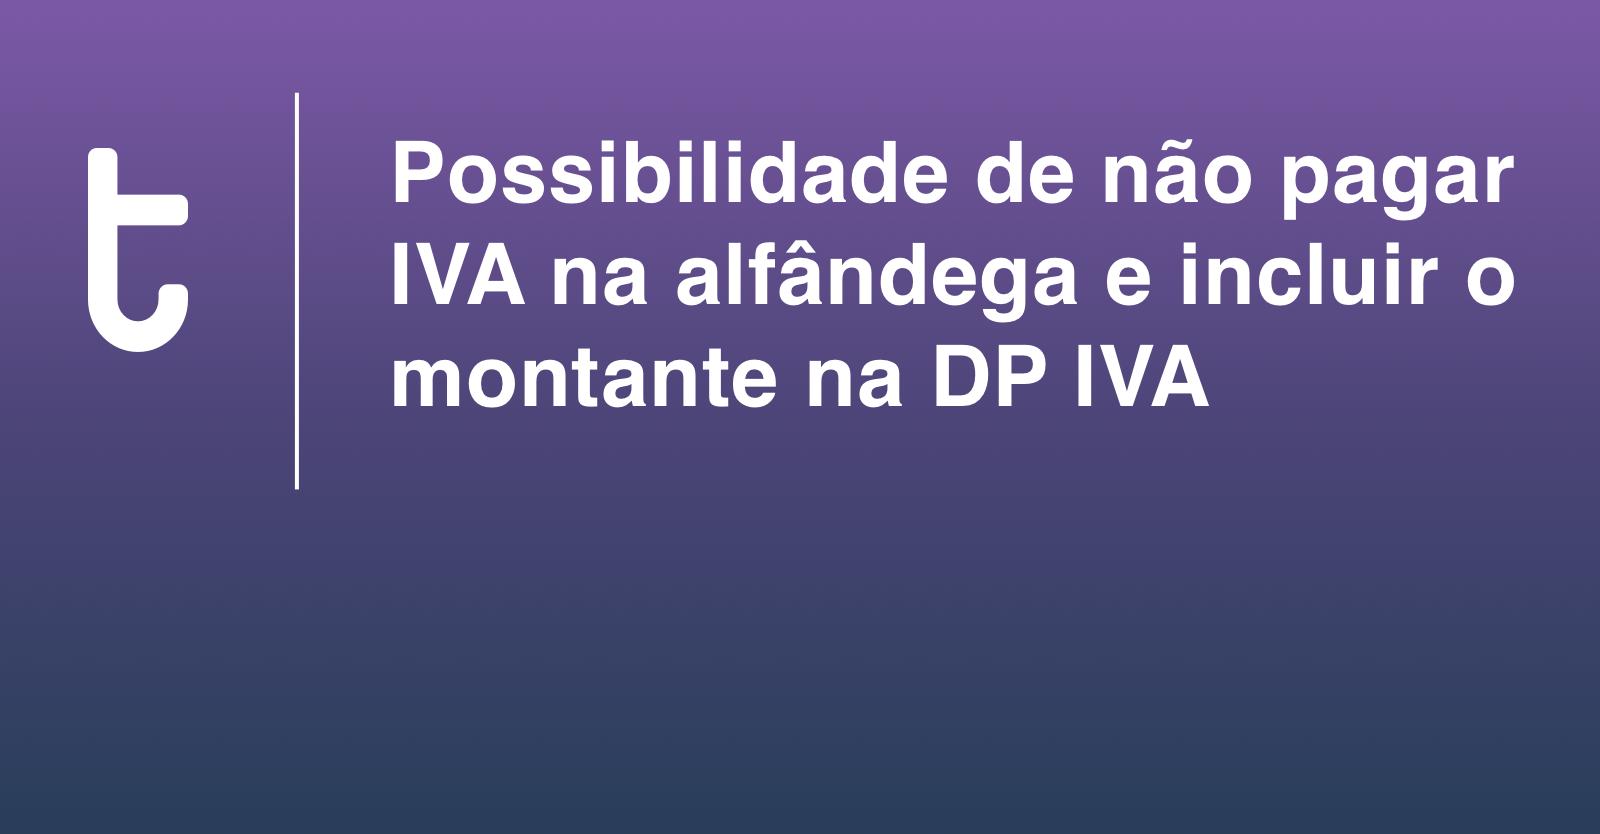 Dp iva 4